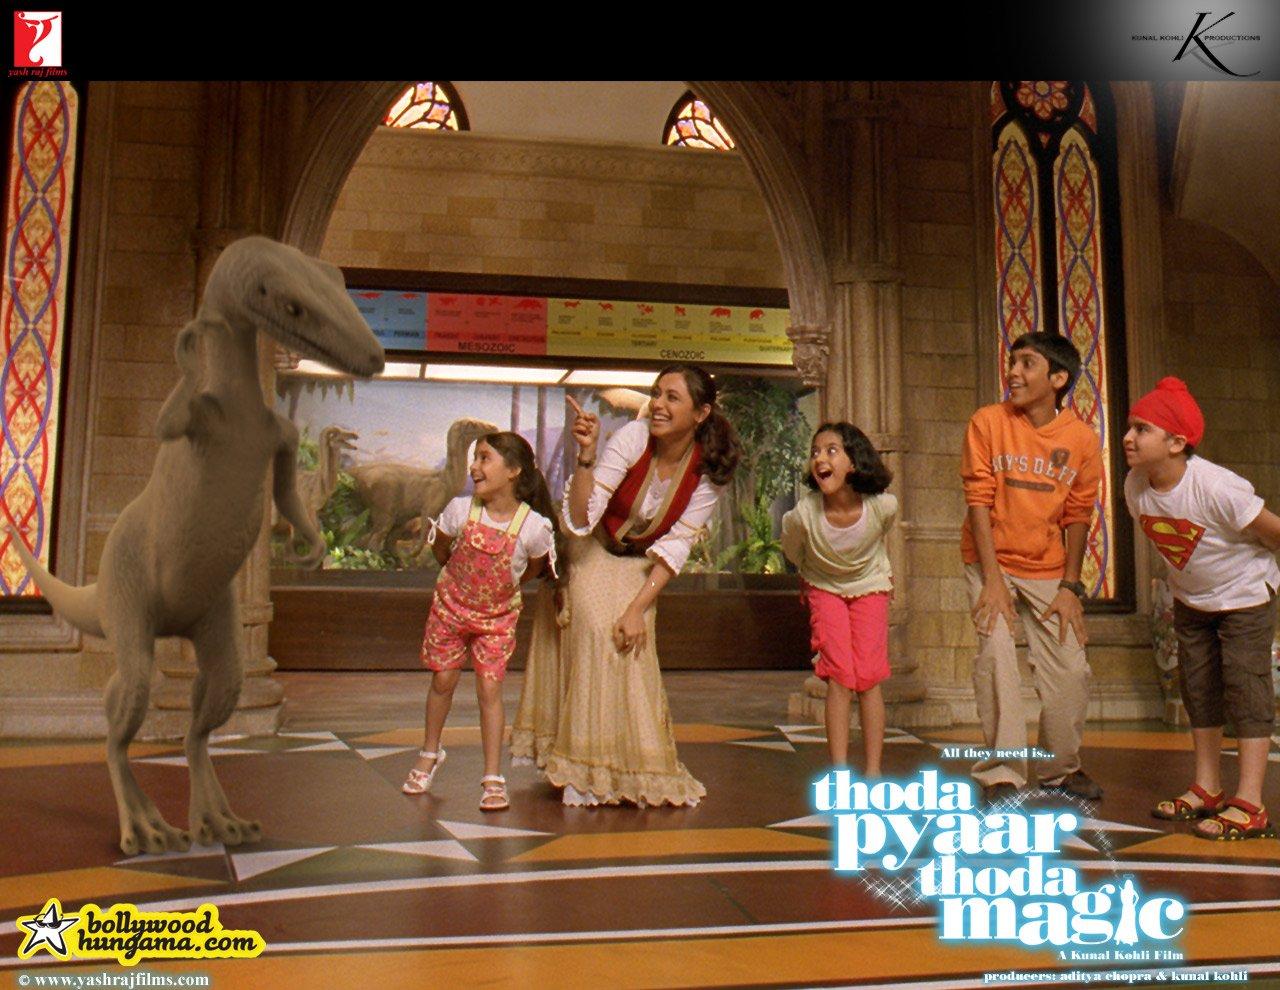 http://i.indiafm.com/posters/movies/08/thodapyaarthodamagic/still25.jpg